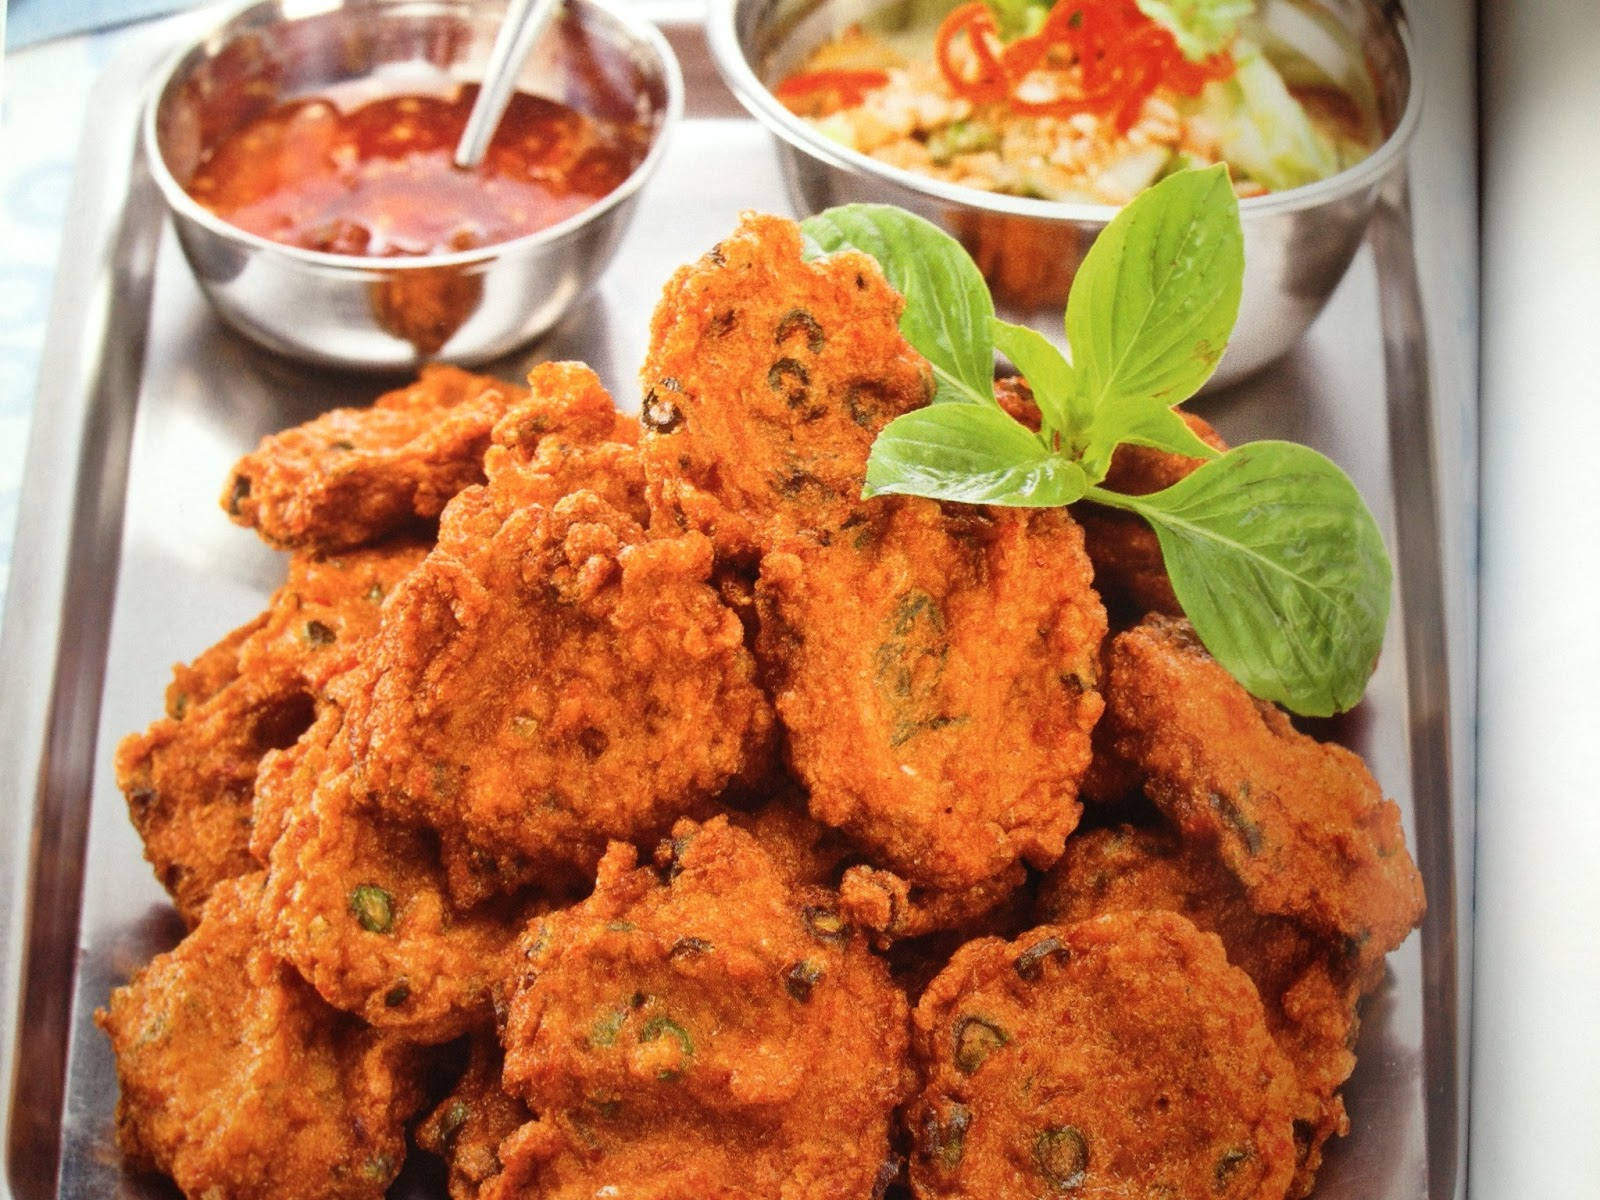 Deep-fried curried fish patties | Asian | Pinterest | Fish